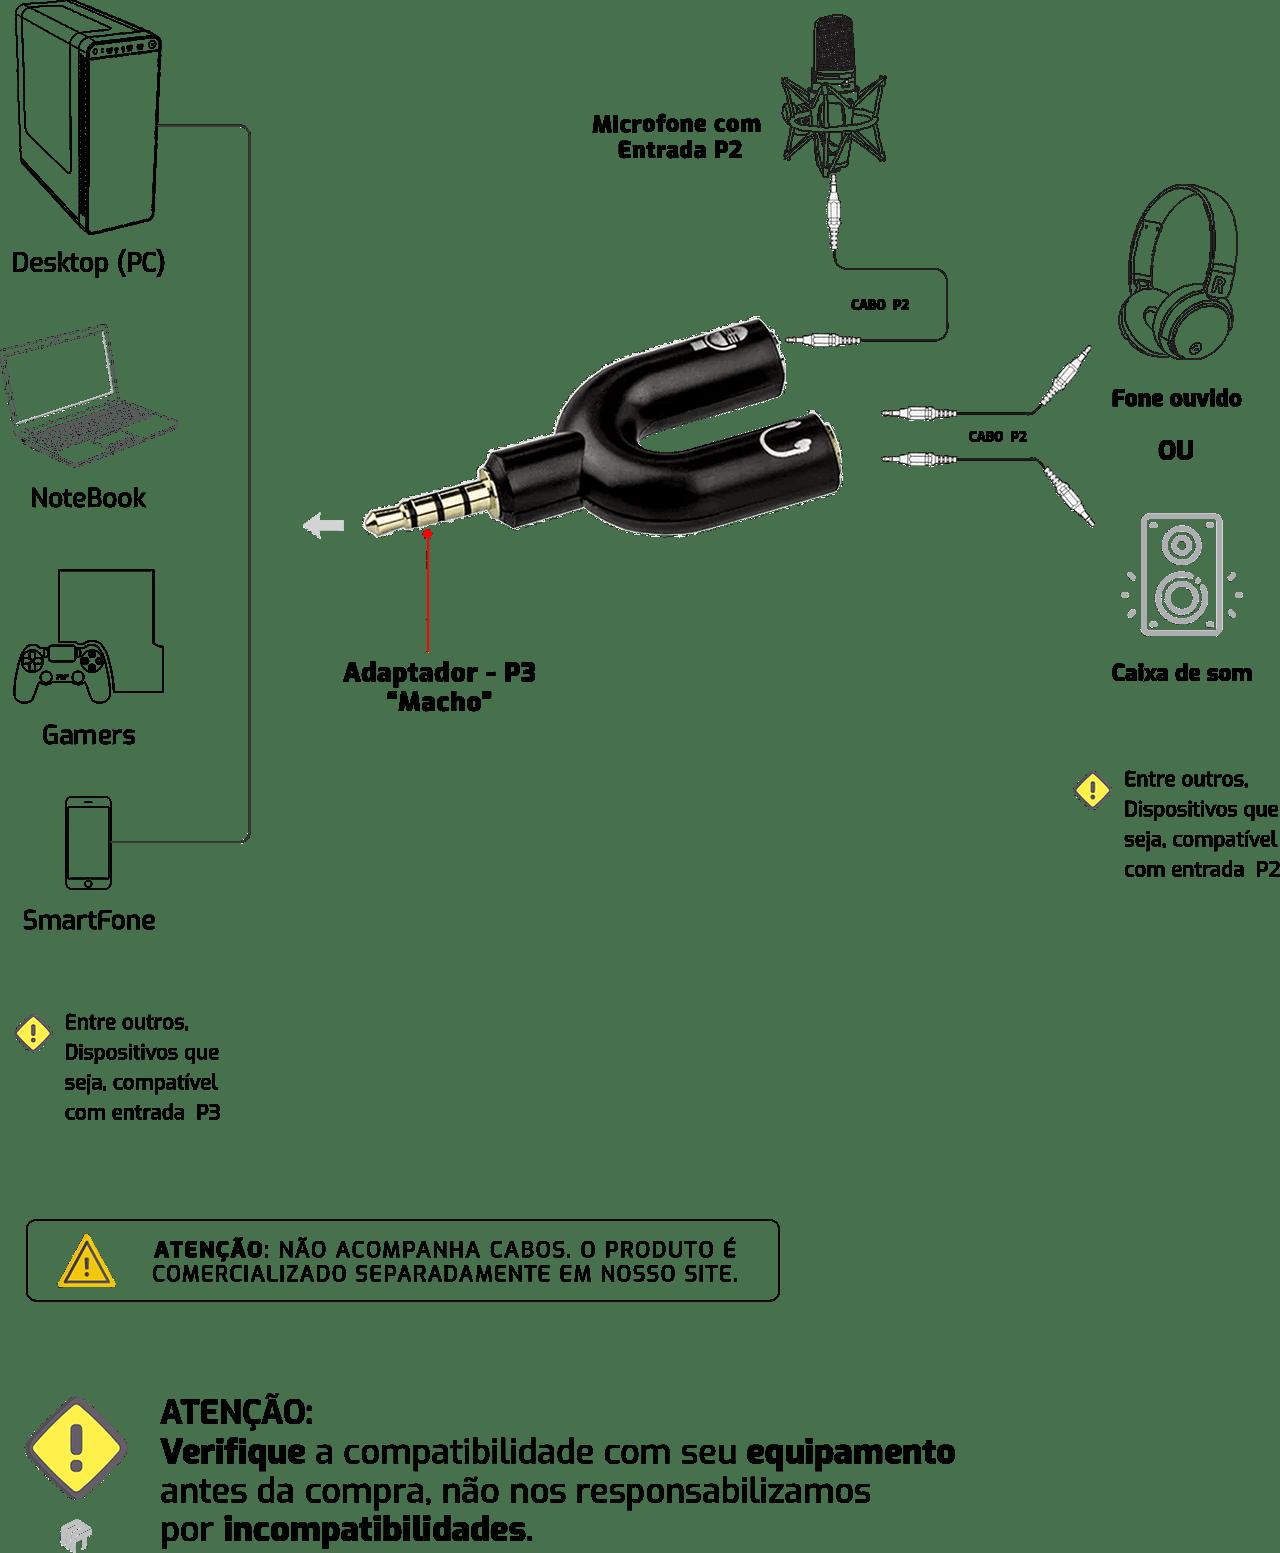 Adaptador P3 X P2 Duplo Fone - Microfone